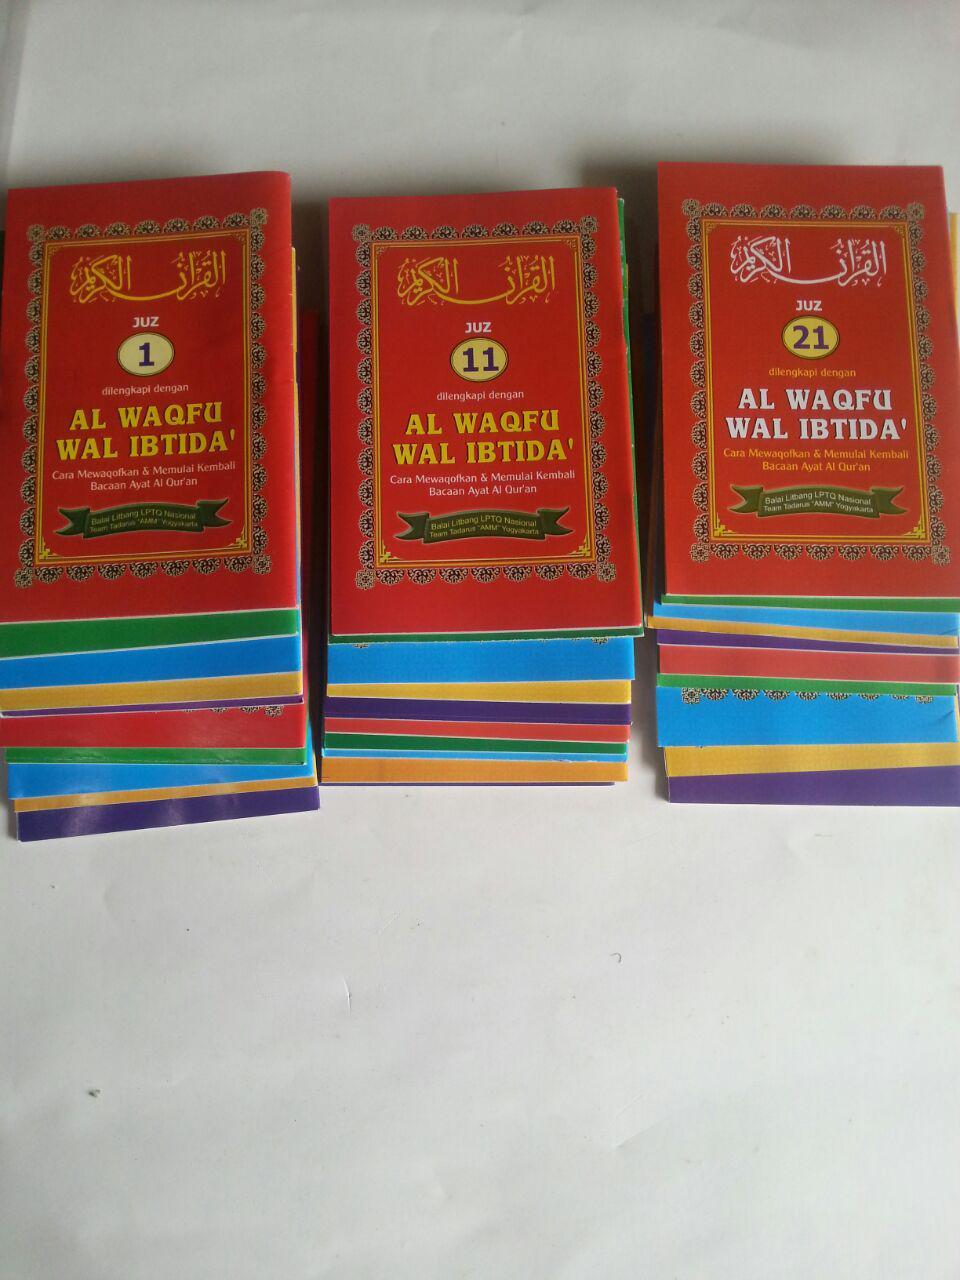 Al-Qur'an Al Waqfu Wal Ibtida Mewaqofkan Memulai Kembali Bacaan Al Quran Set cover 3